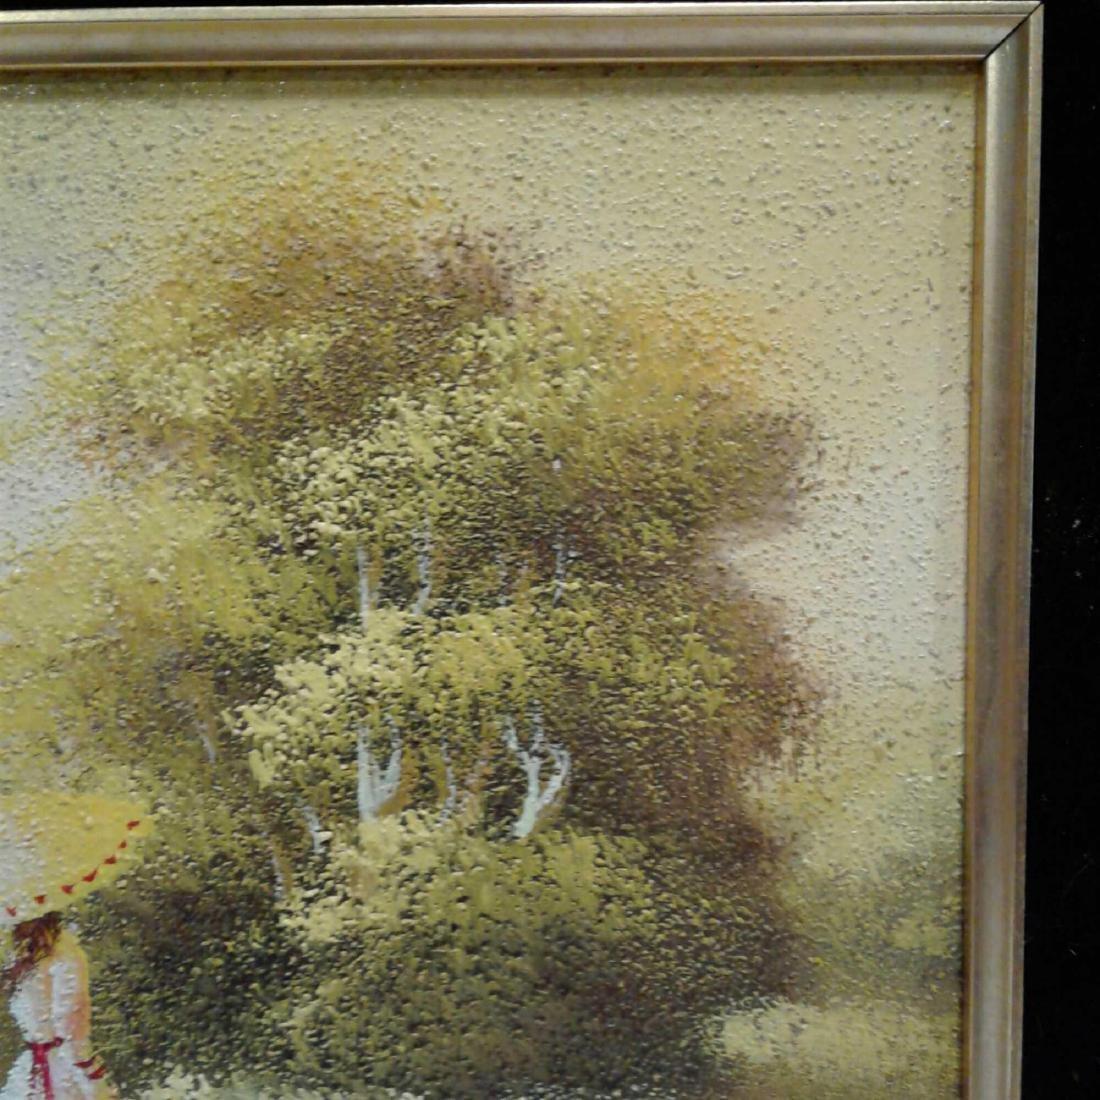 Sandy Grit Textured Impasto Oil Painting - 5